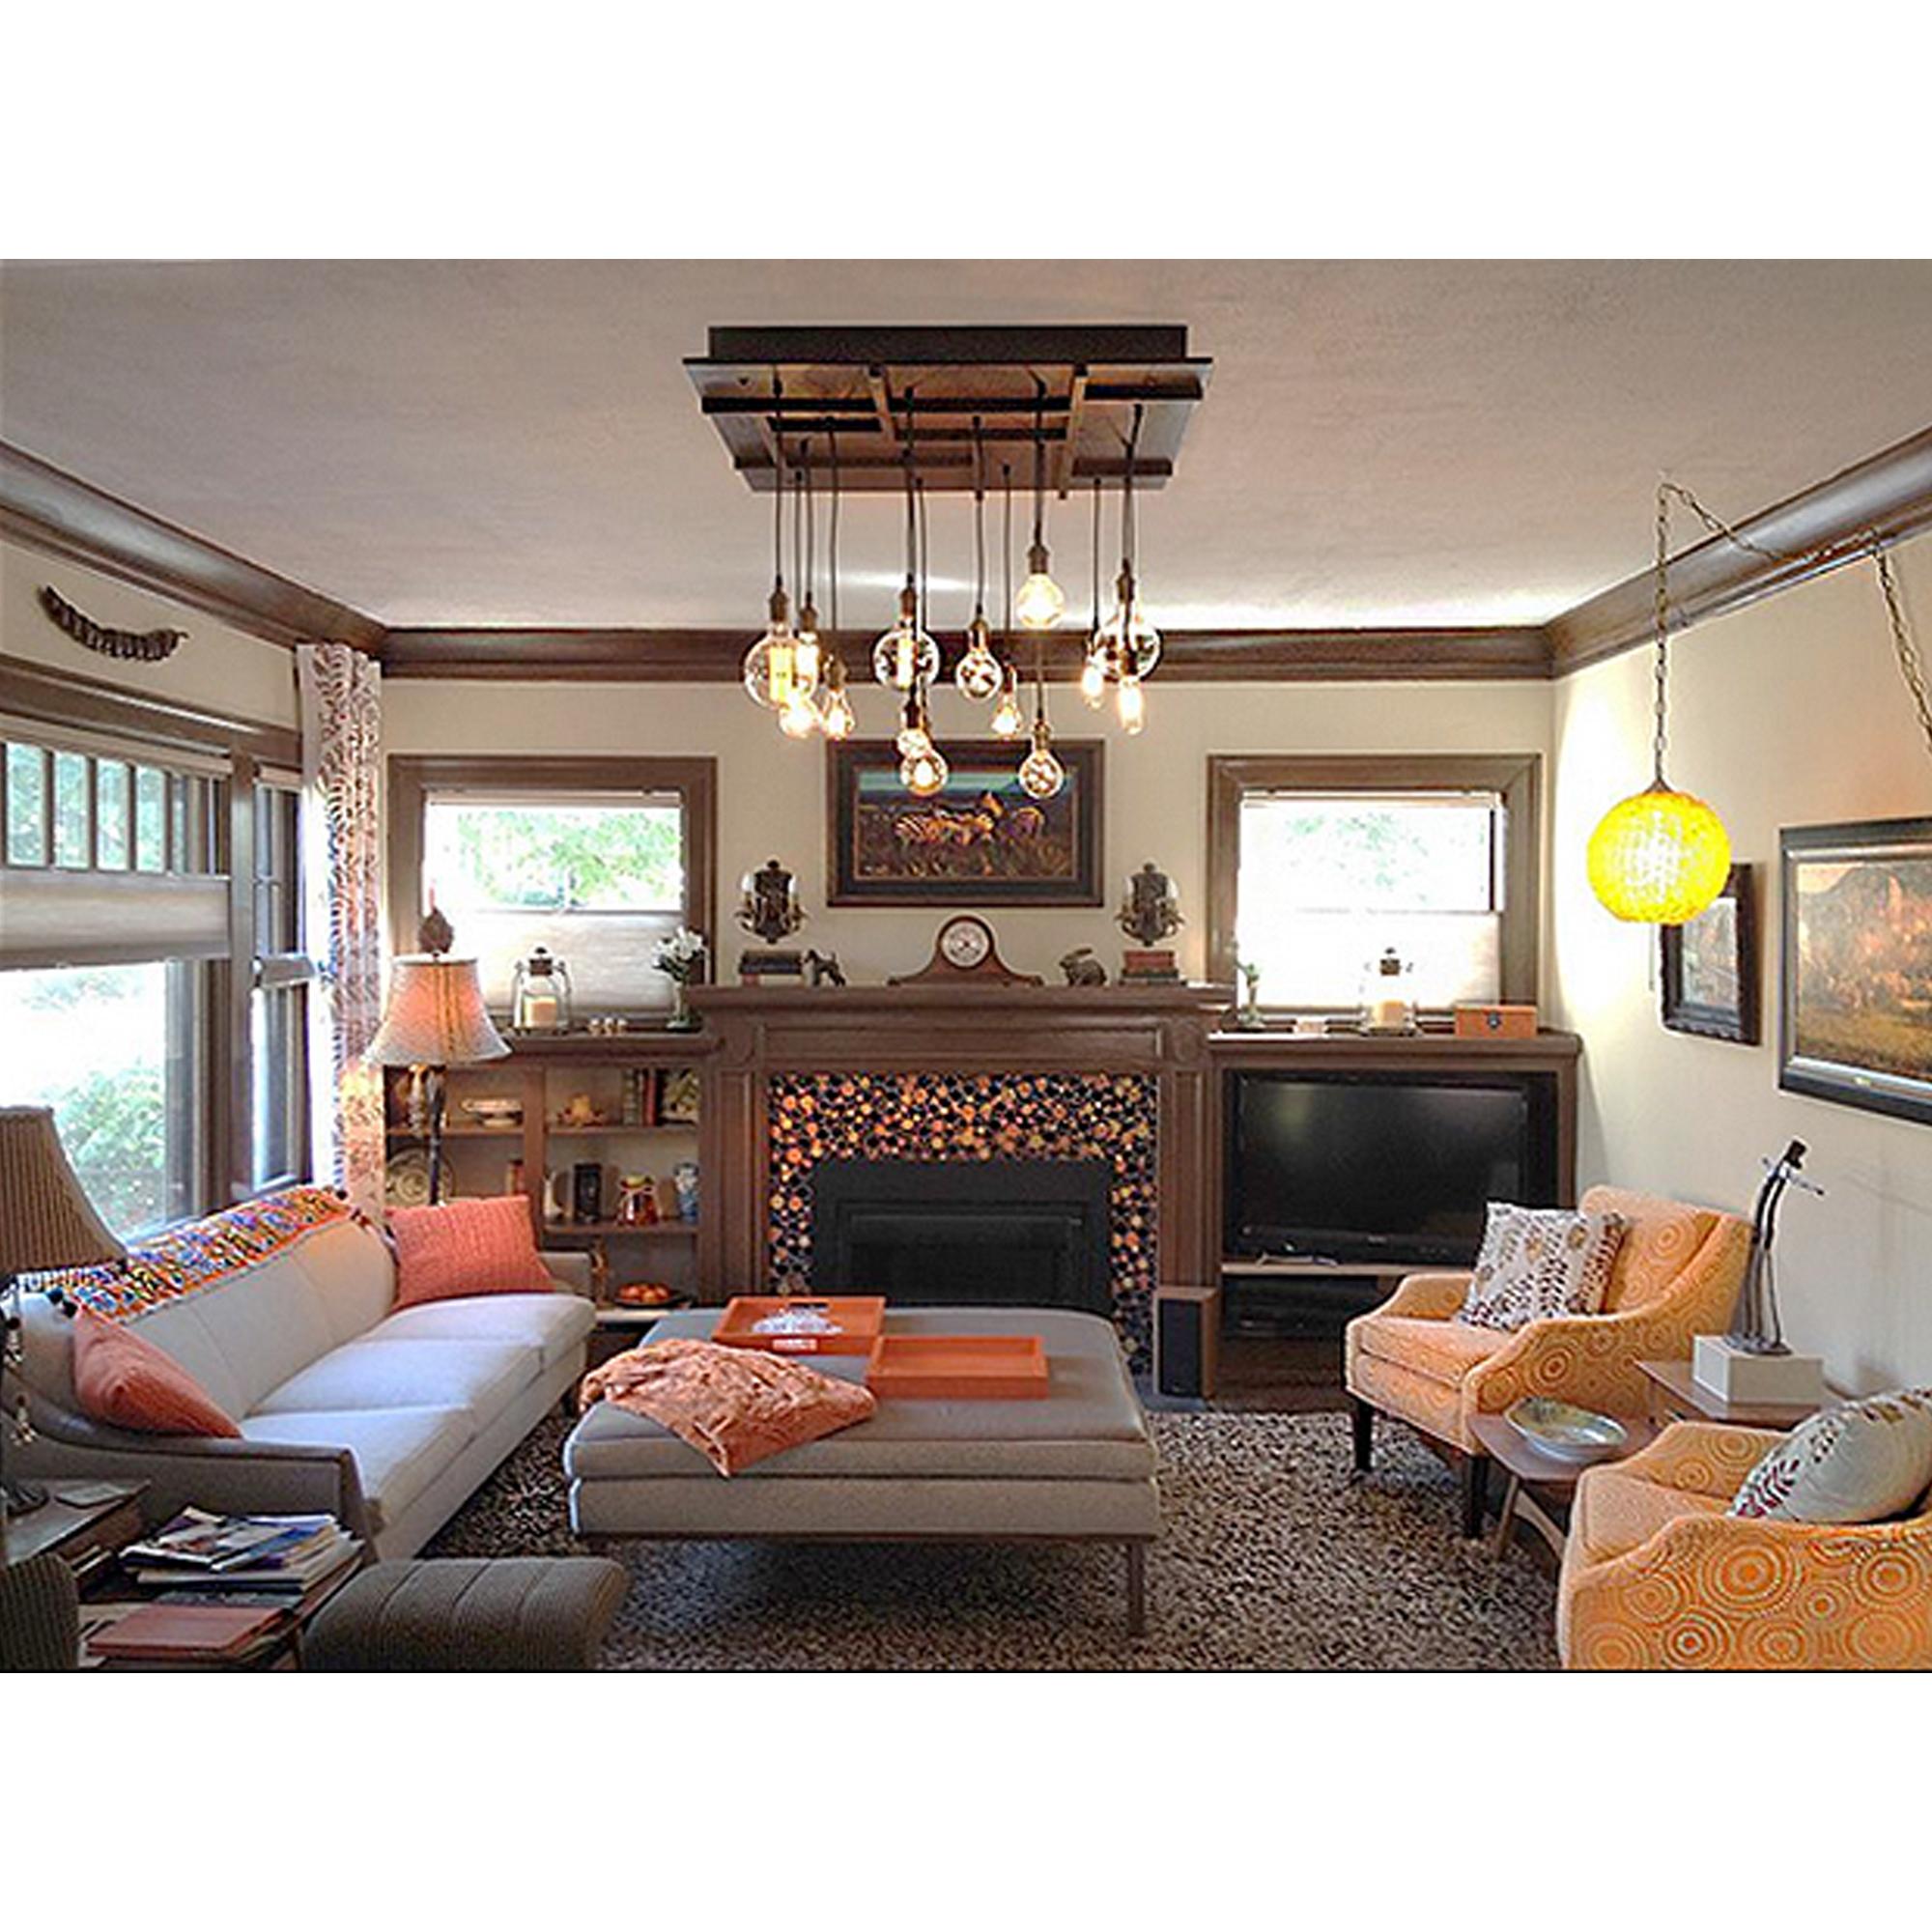 Multi Pendant edison bulb chandelier in a living room